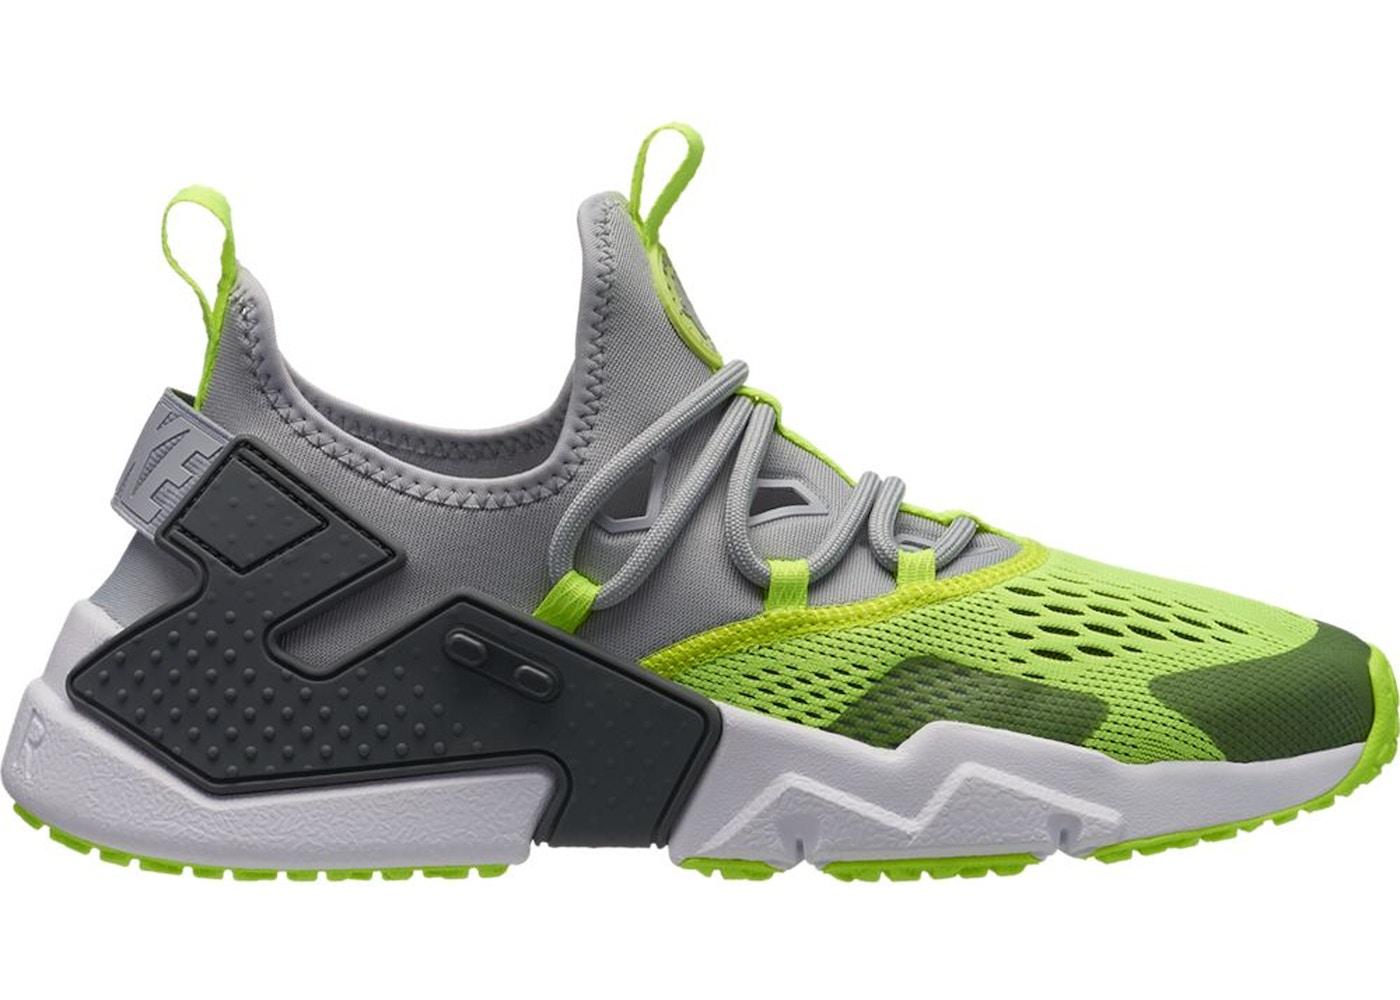 Nike Air Huarache Drift Wolf Grey Volt - AO1133-001